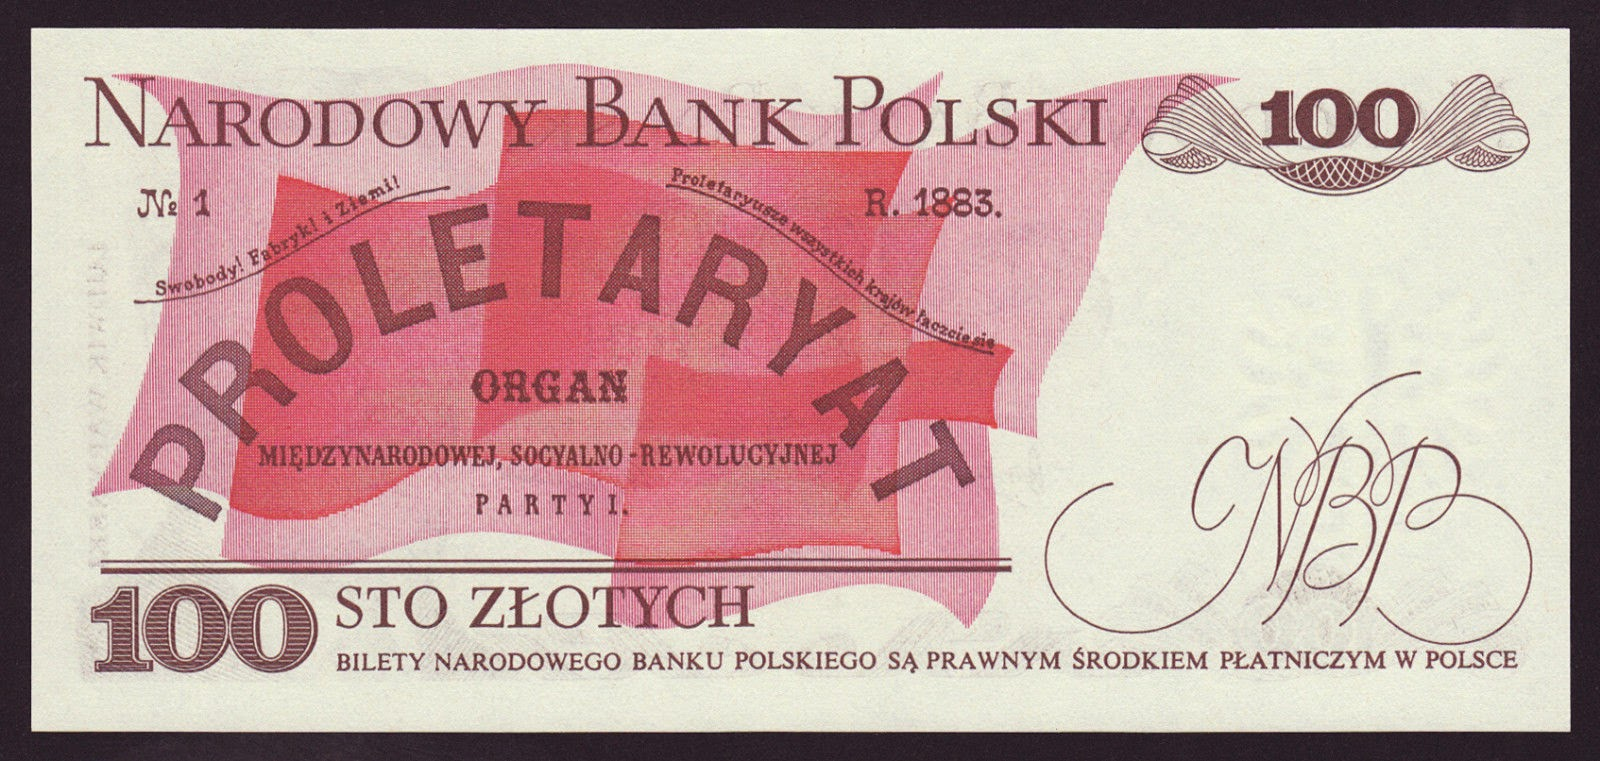 Poland Banknotes 100 Zloty banknote 1975 Proletariat